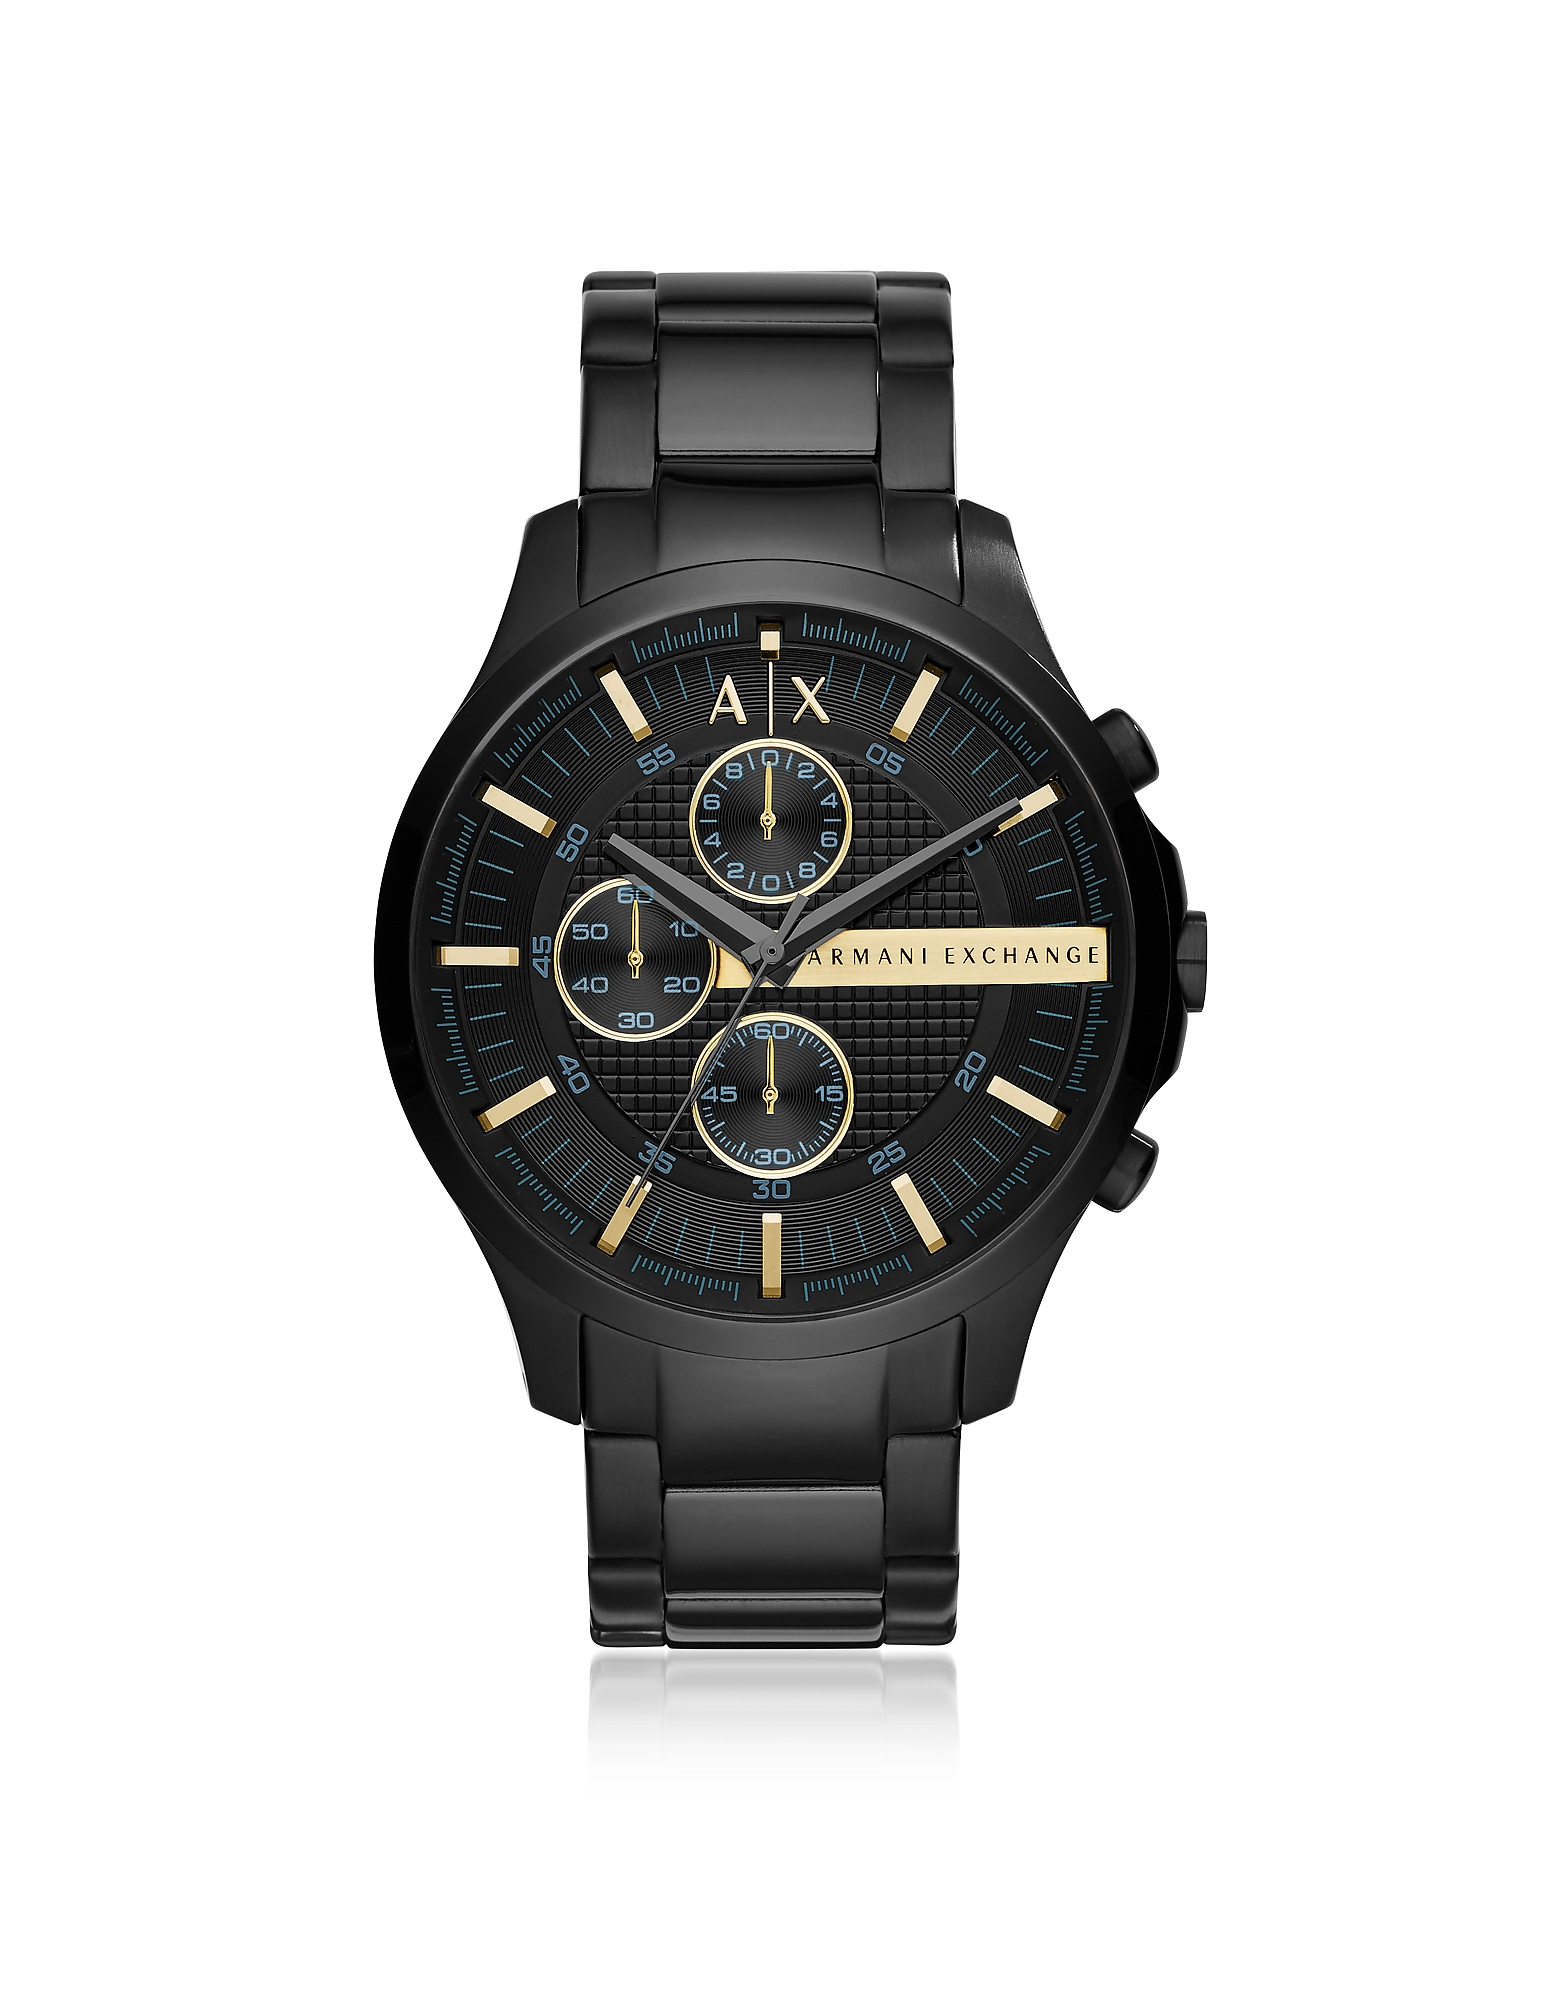 Armani Exchange Men's Watches, Hampton Black Chronograph Men's Watch